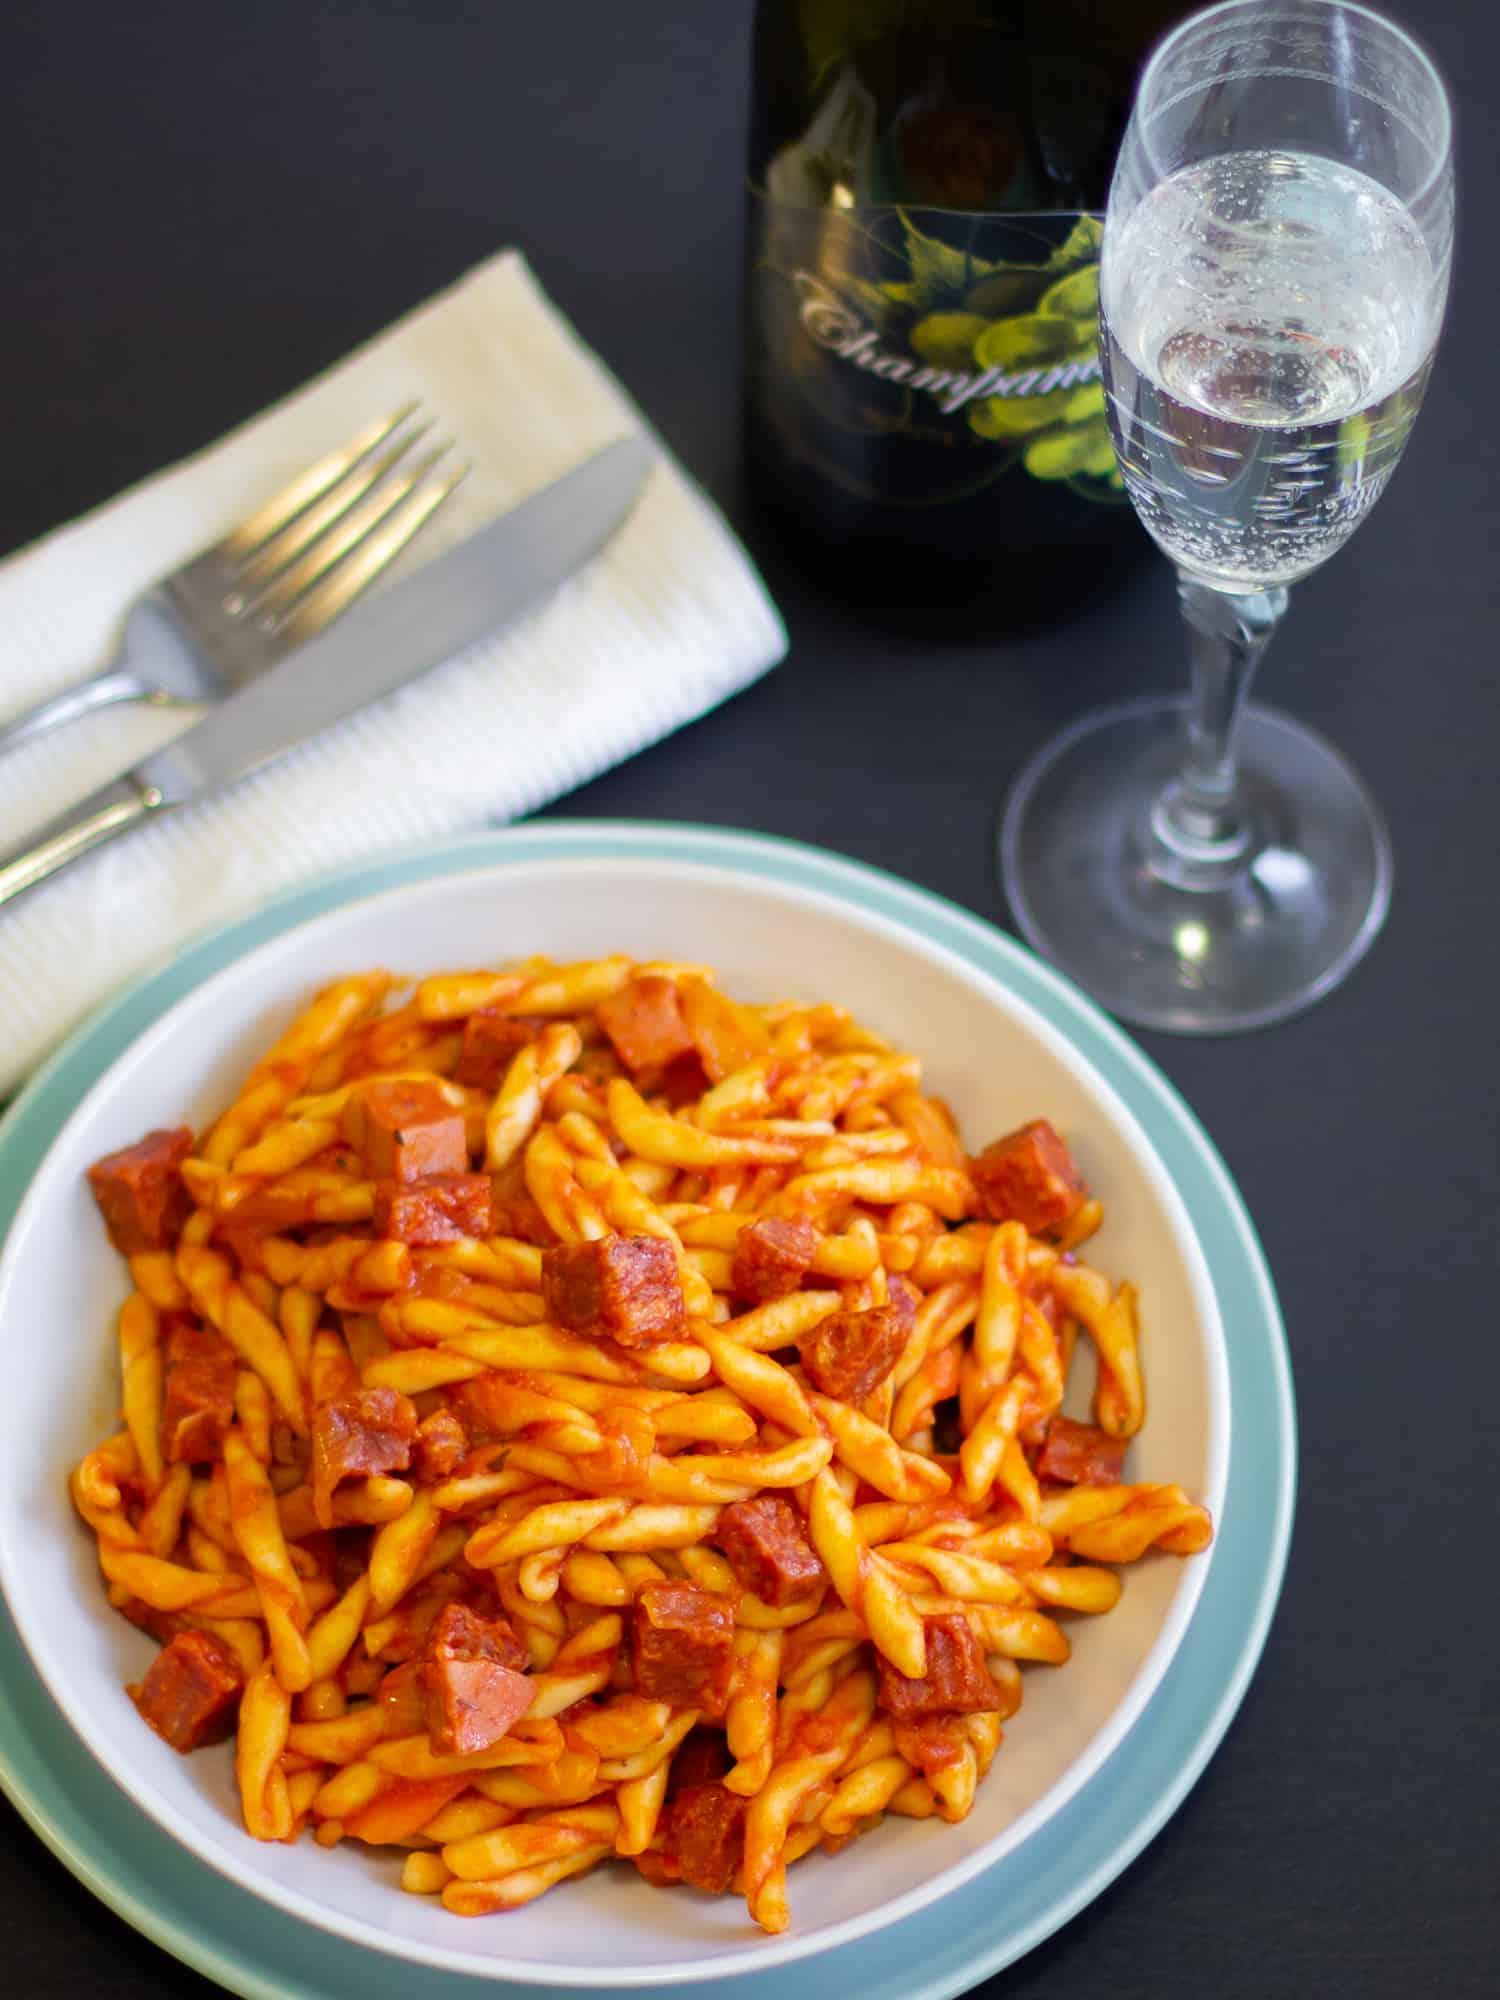 Rustic Italian pasta sauce recipe made with pancetta, mortadella and soppressata salami. Fresh tomatoes, basil, onion and peppers sweeten the sauce.